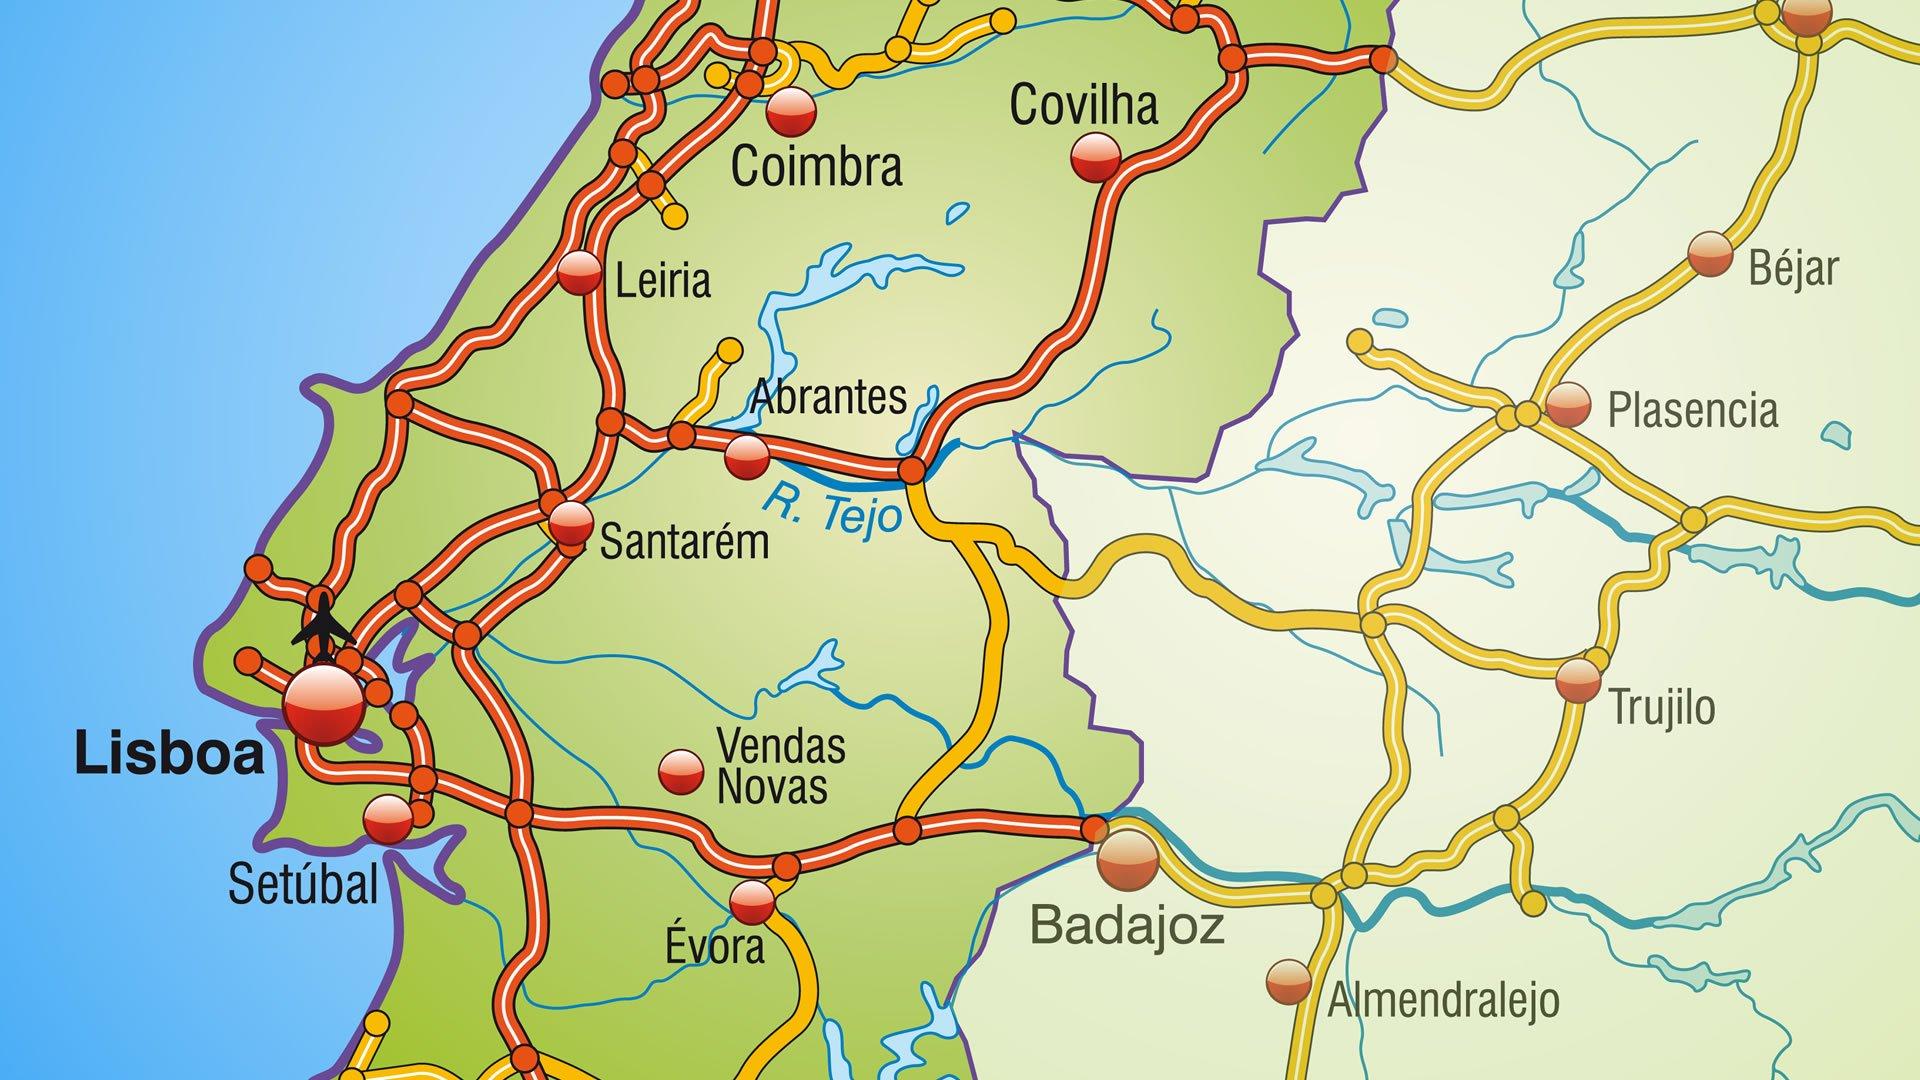 fatima portugal map with Mapa De Autovias Portugal Zona Centro on Sintra together with Portuguese Pottery Wine Tasting likewise 9968773353 as well Pico Ruivo Madeira moreover Etape N11 le Dimanche 17 mai 09 de Minde a Fatima 1538223.